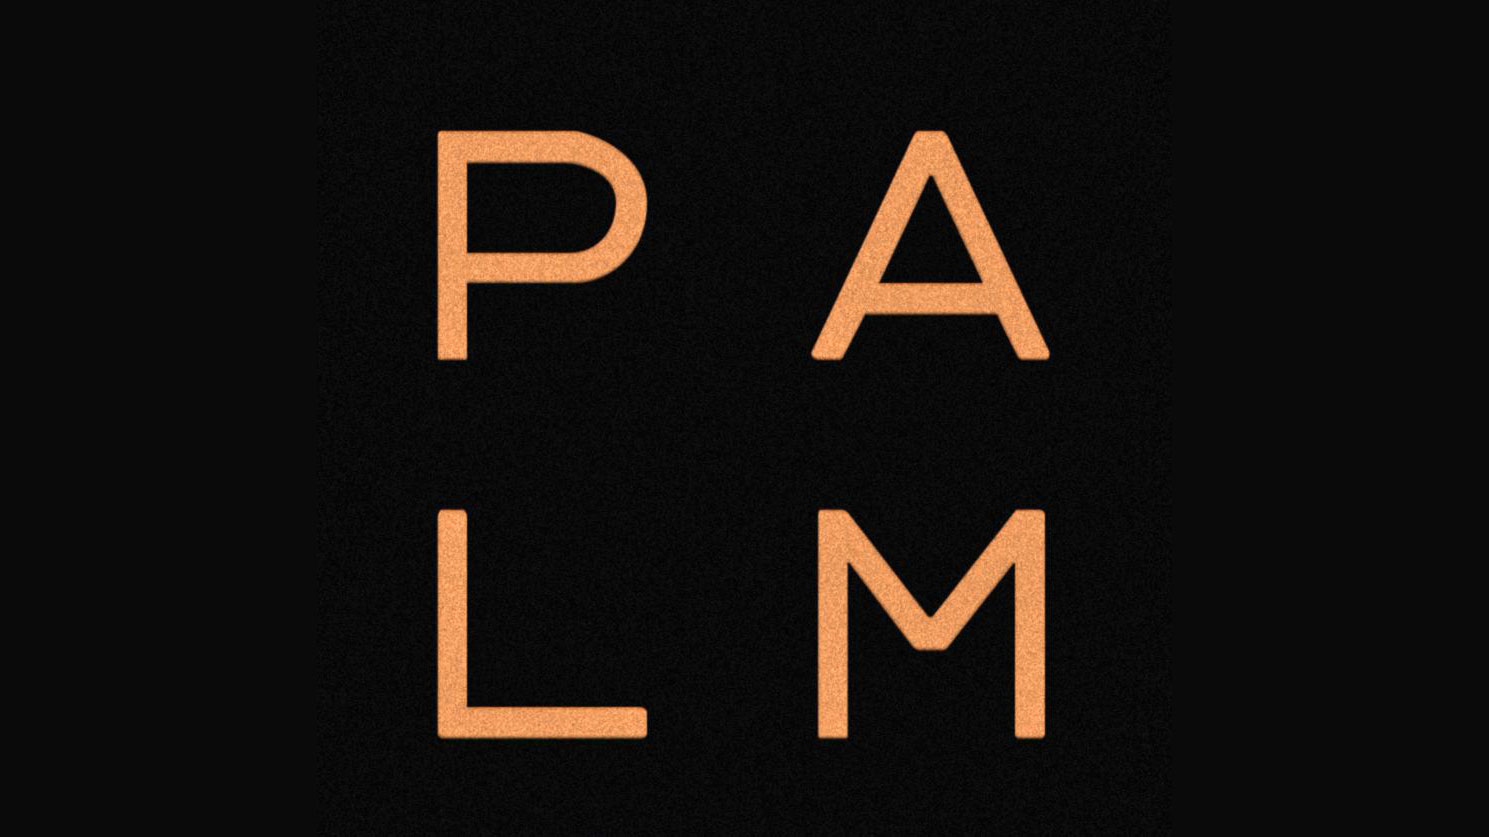 لوگو جدید شرکت پالم (Palm) لو رفت